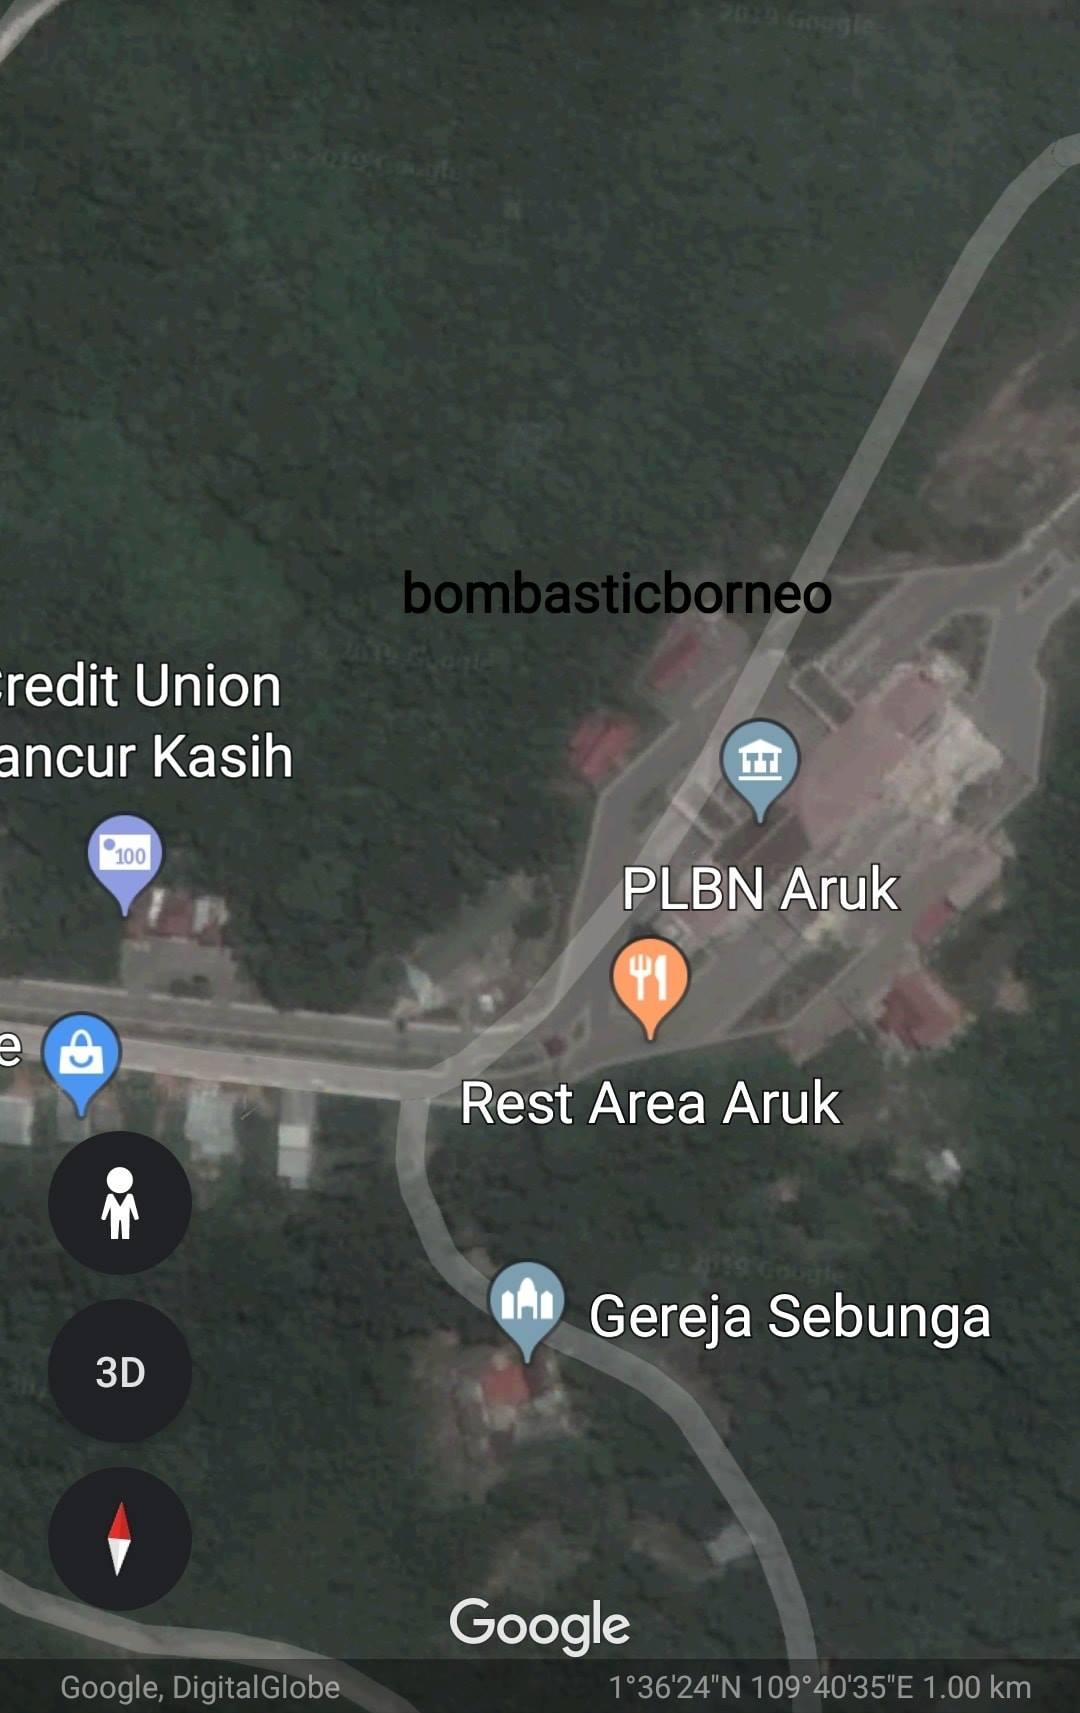 Perbatasan Aruk, Biawak Border Post, Borneo, CIQs, event, Imigrasi Aruk, Obyek wisata, PLBN, Pos Lintas Batas Negara, Sajingan Besar, Tourism, Cross Border, Festival wonderful, 跨境婆罗洲, 印尼西加里曼丹